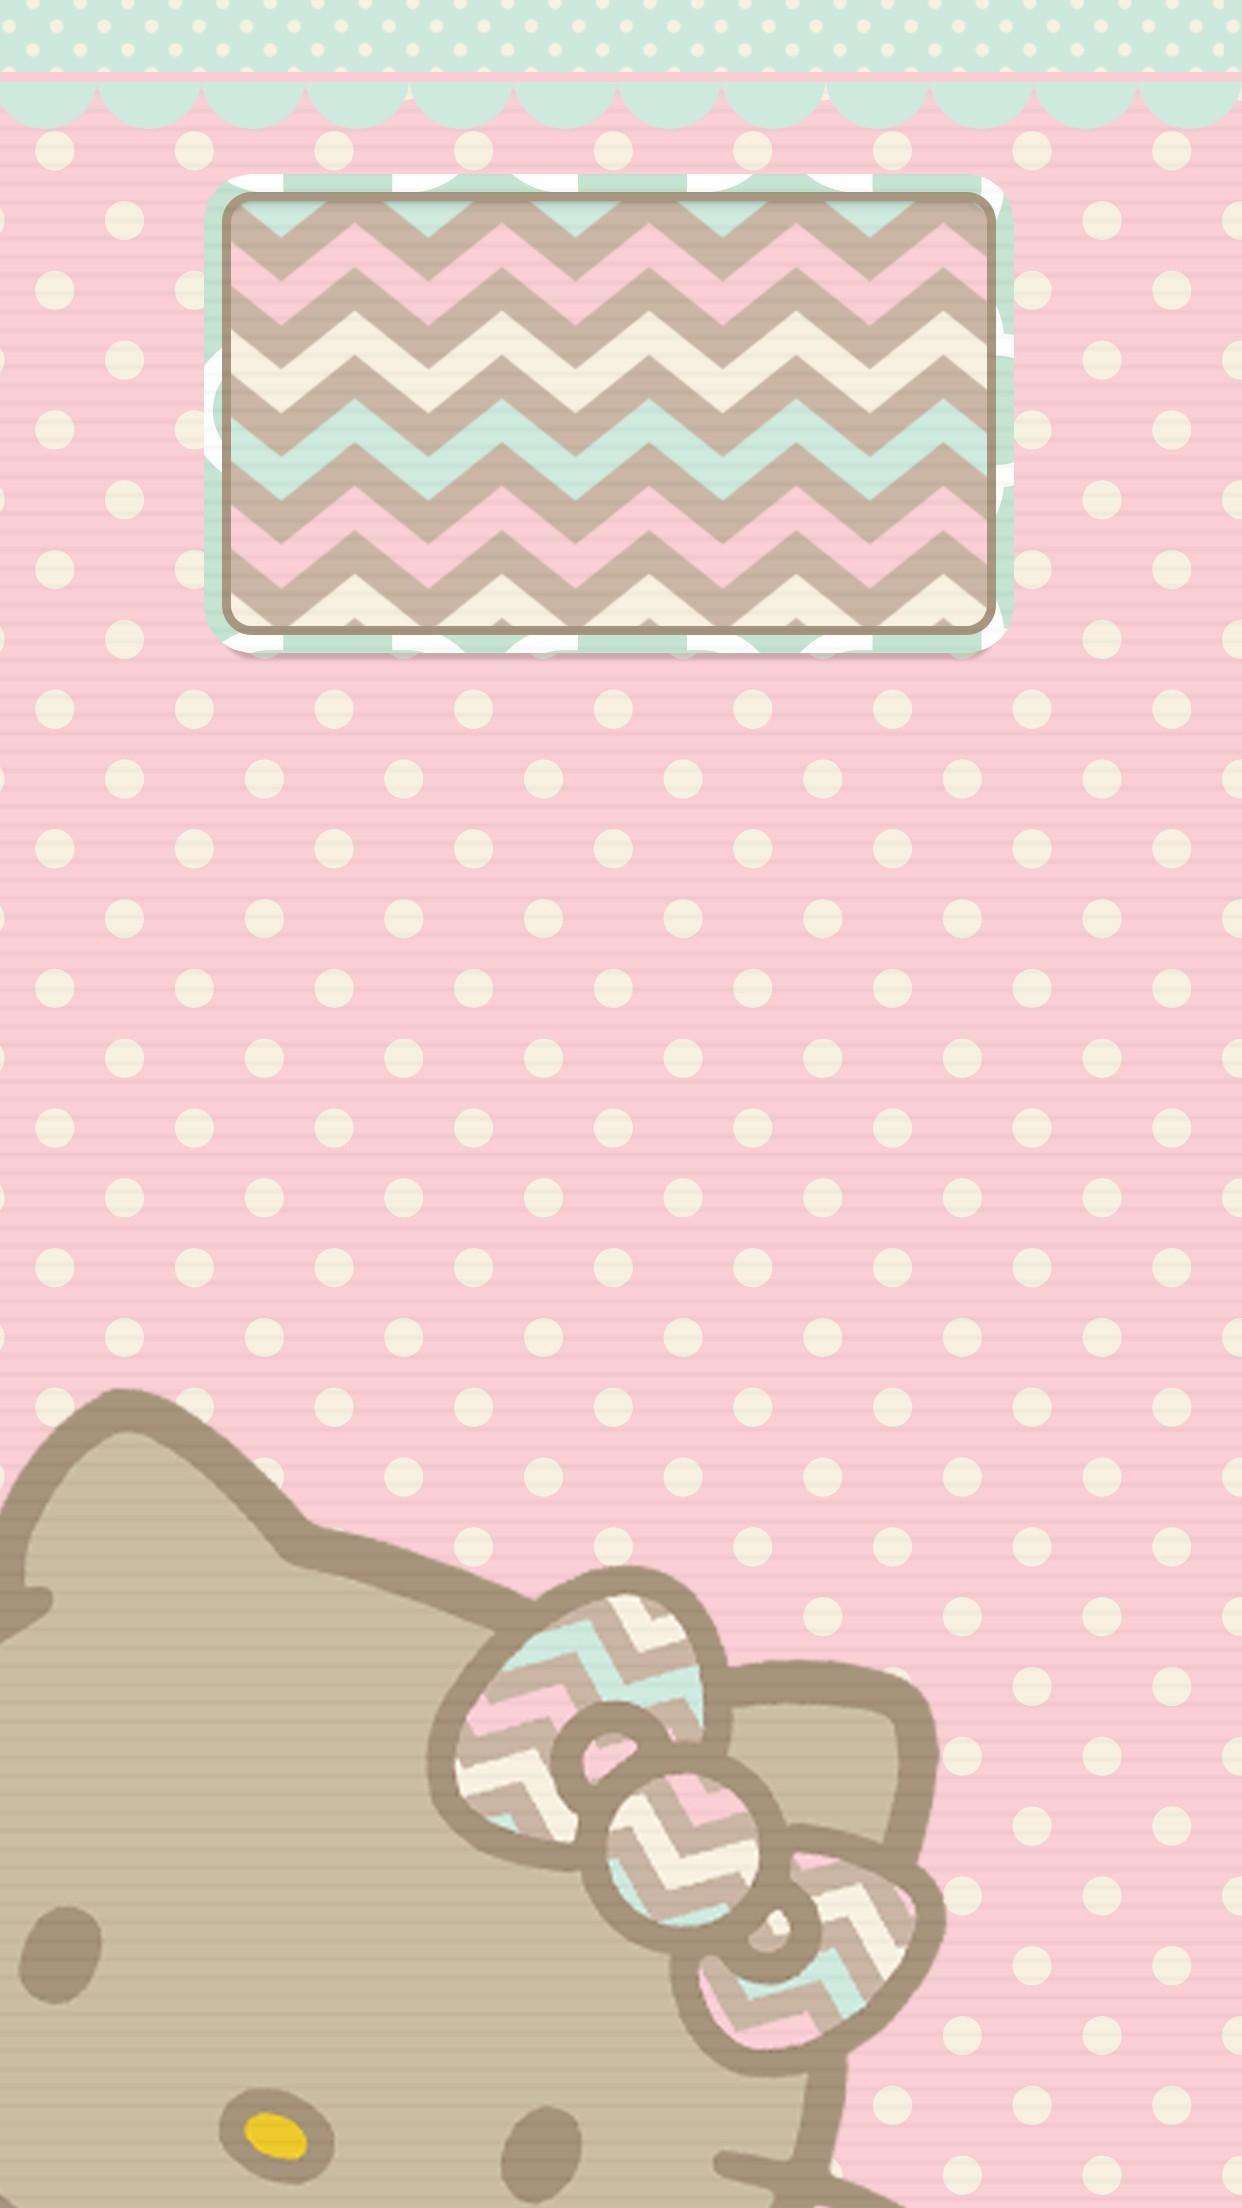 Pastel Walls, Hello Kitty Wallpaper, Sanrio, Phone Wallpapers, Kawaii,  Wallpapers, Screen, Wall, Printable